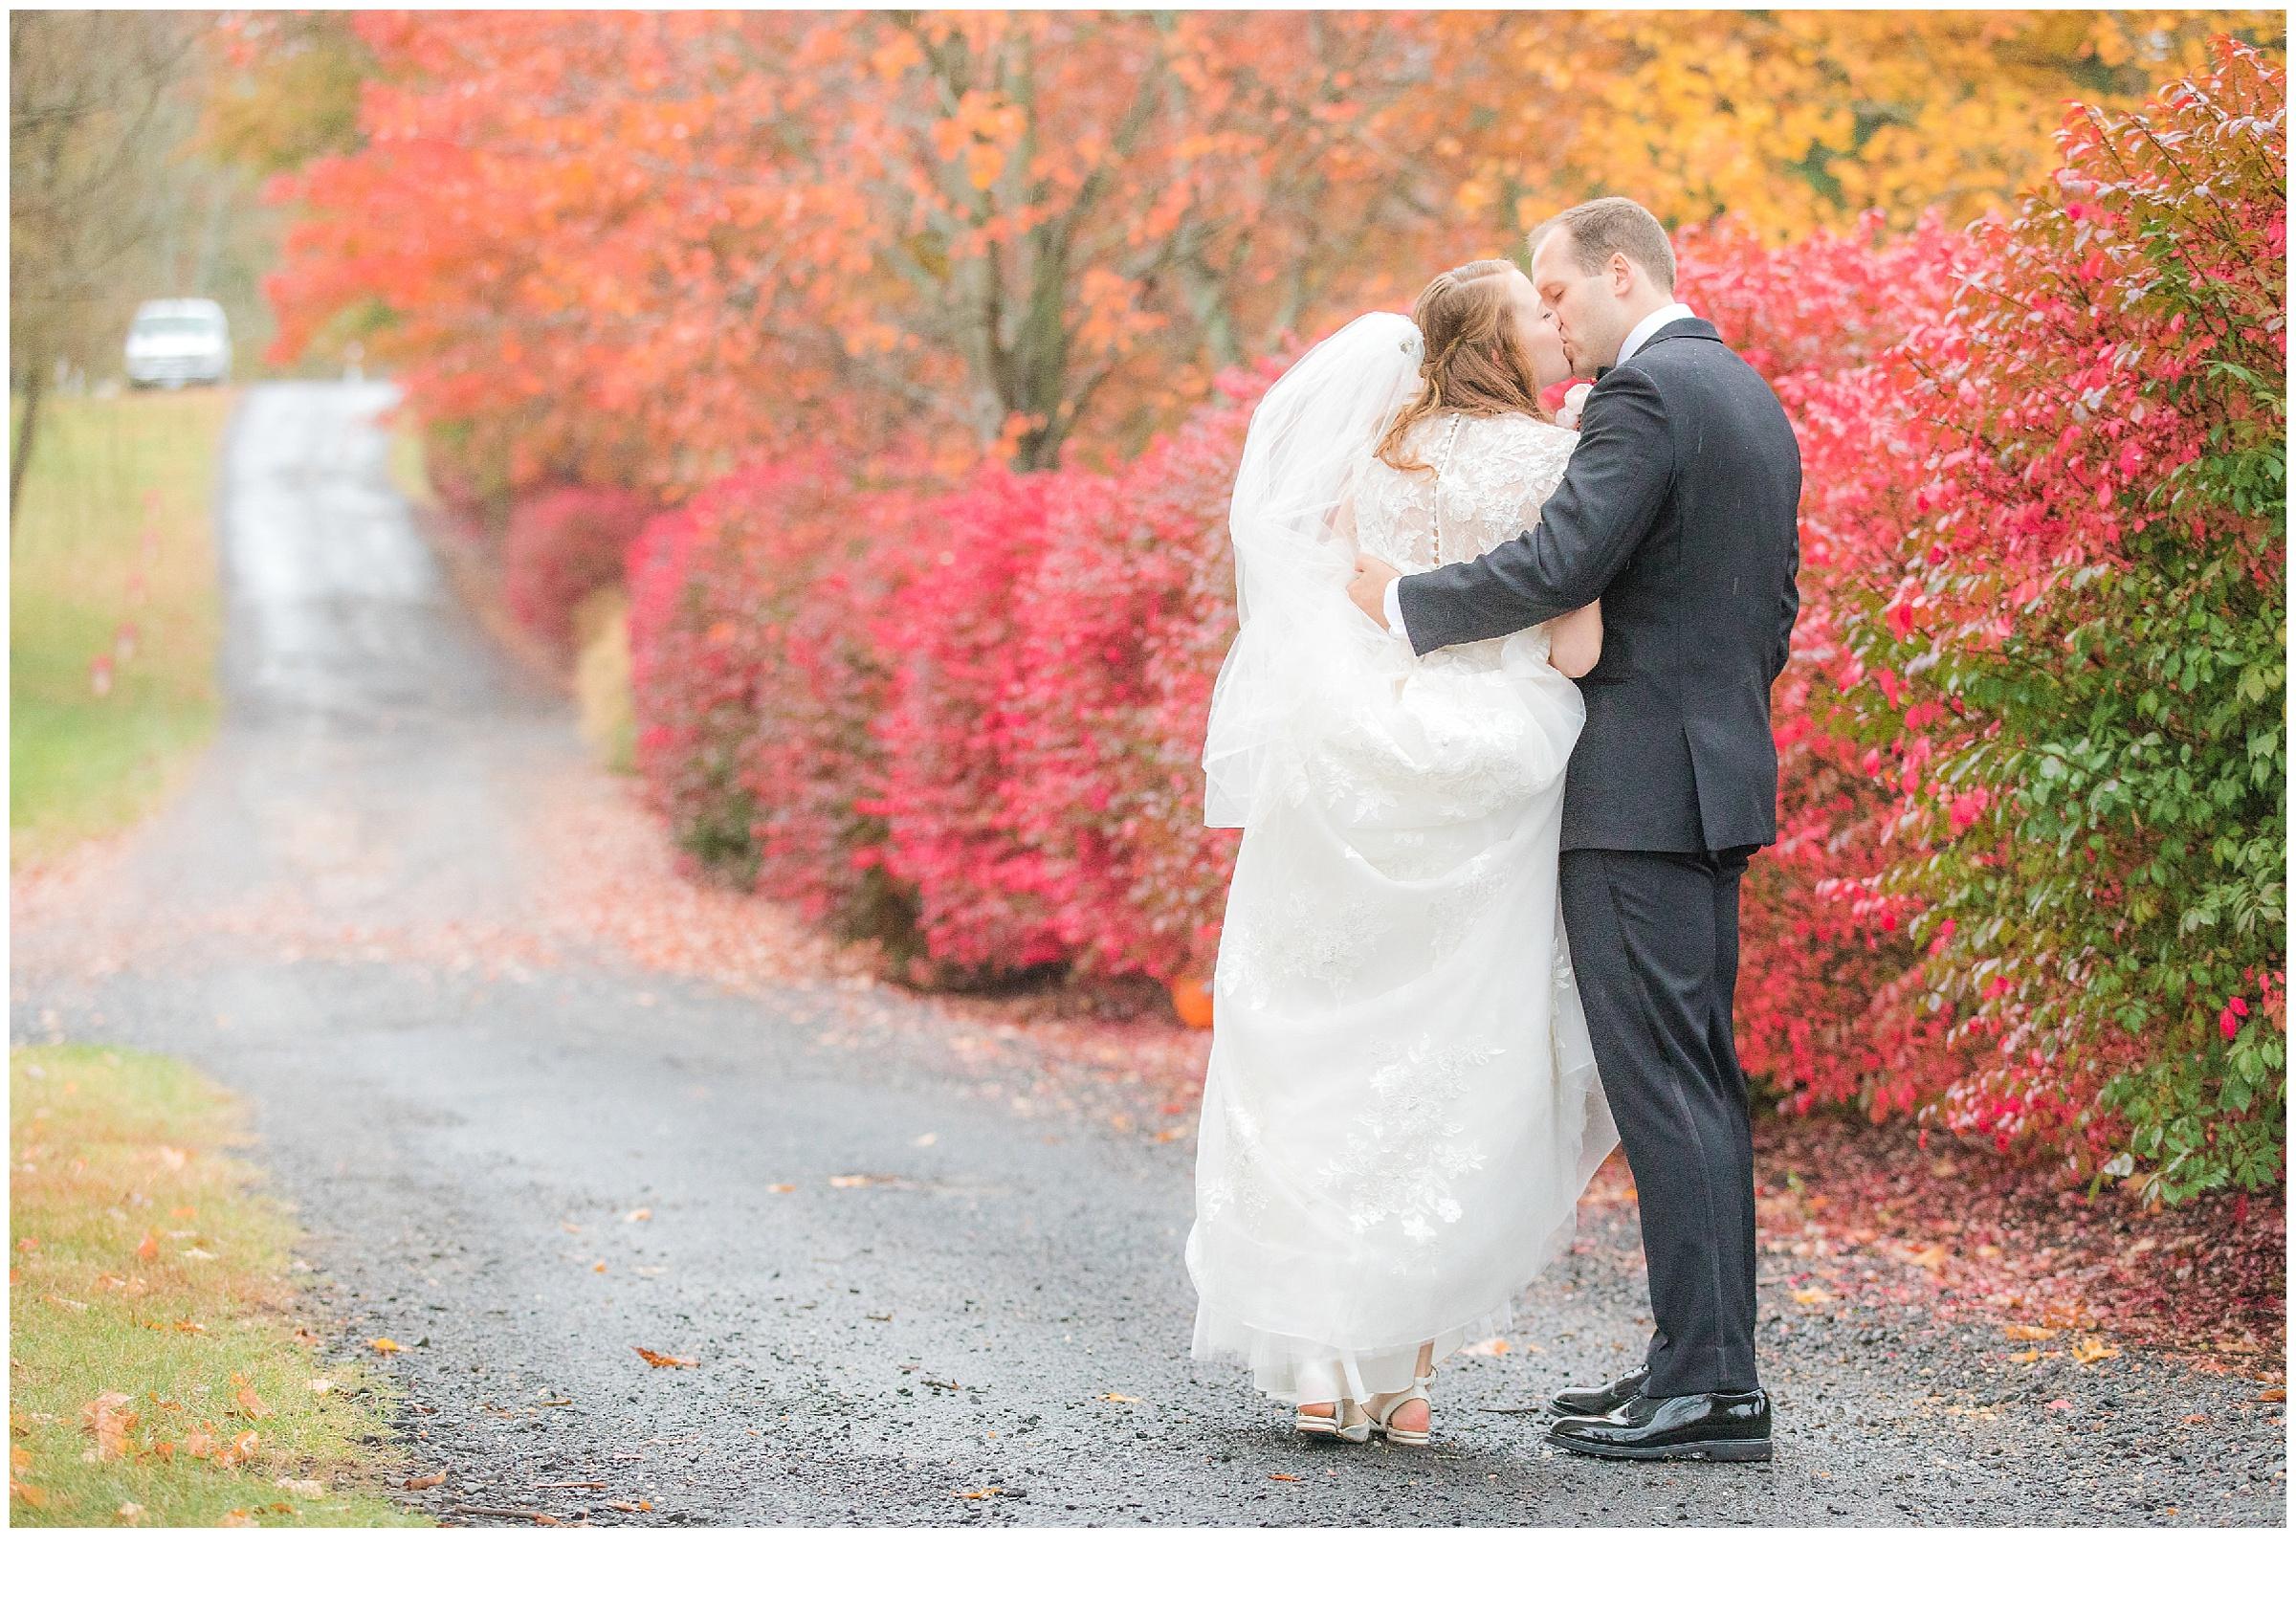 Rainy Wedding Day1.jpg